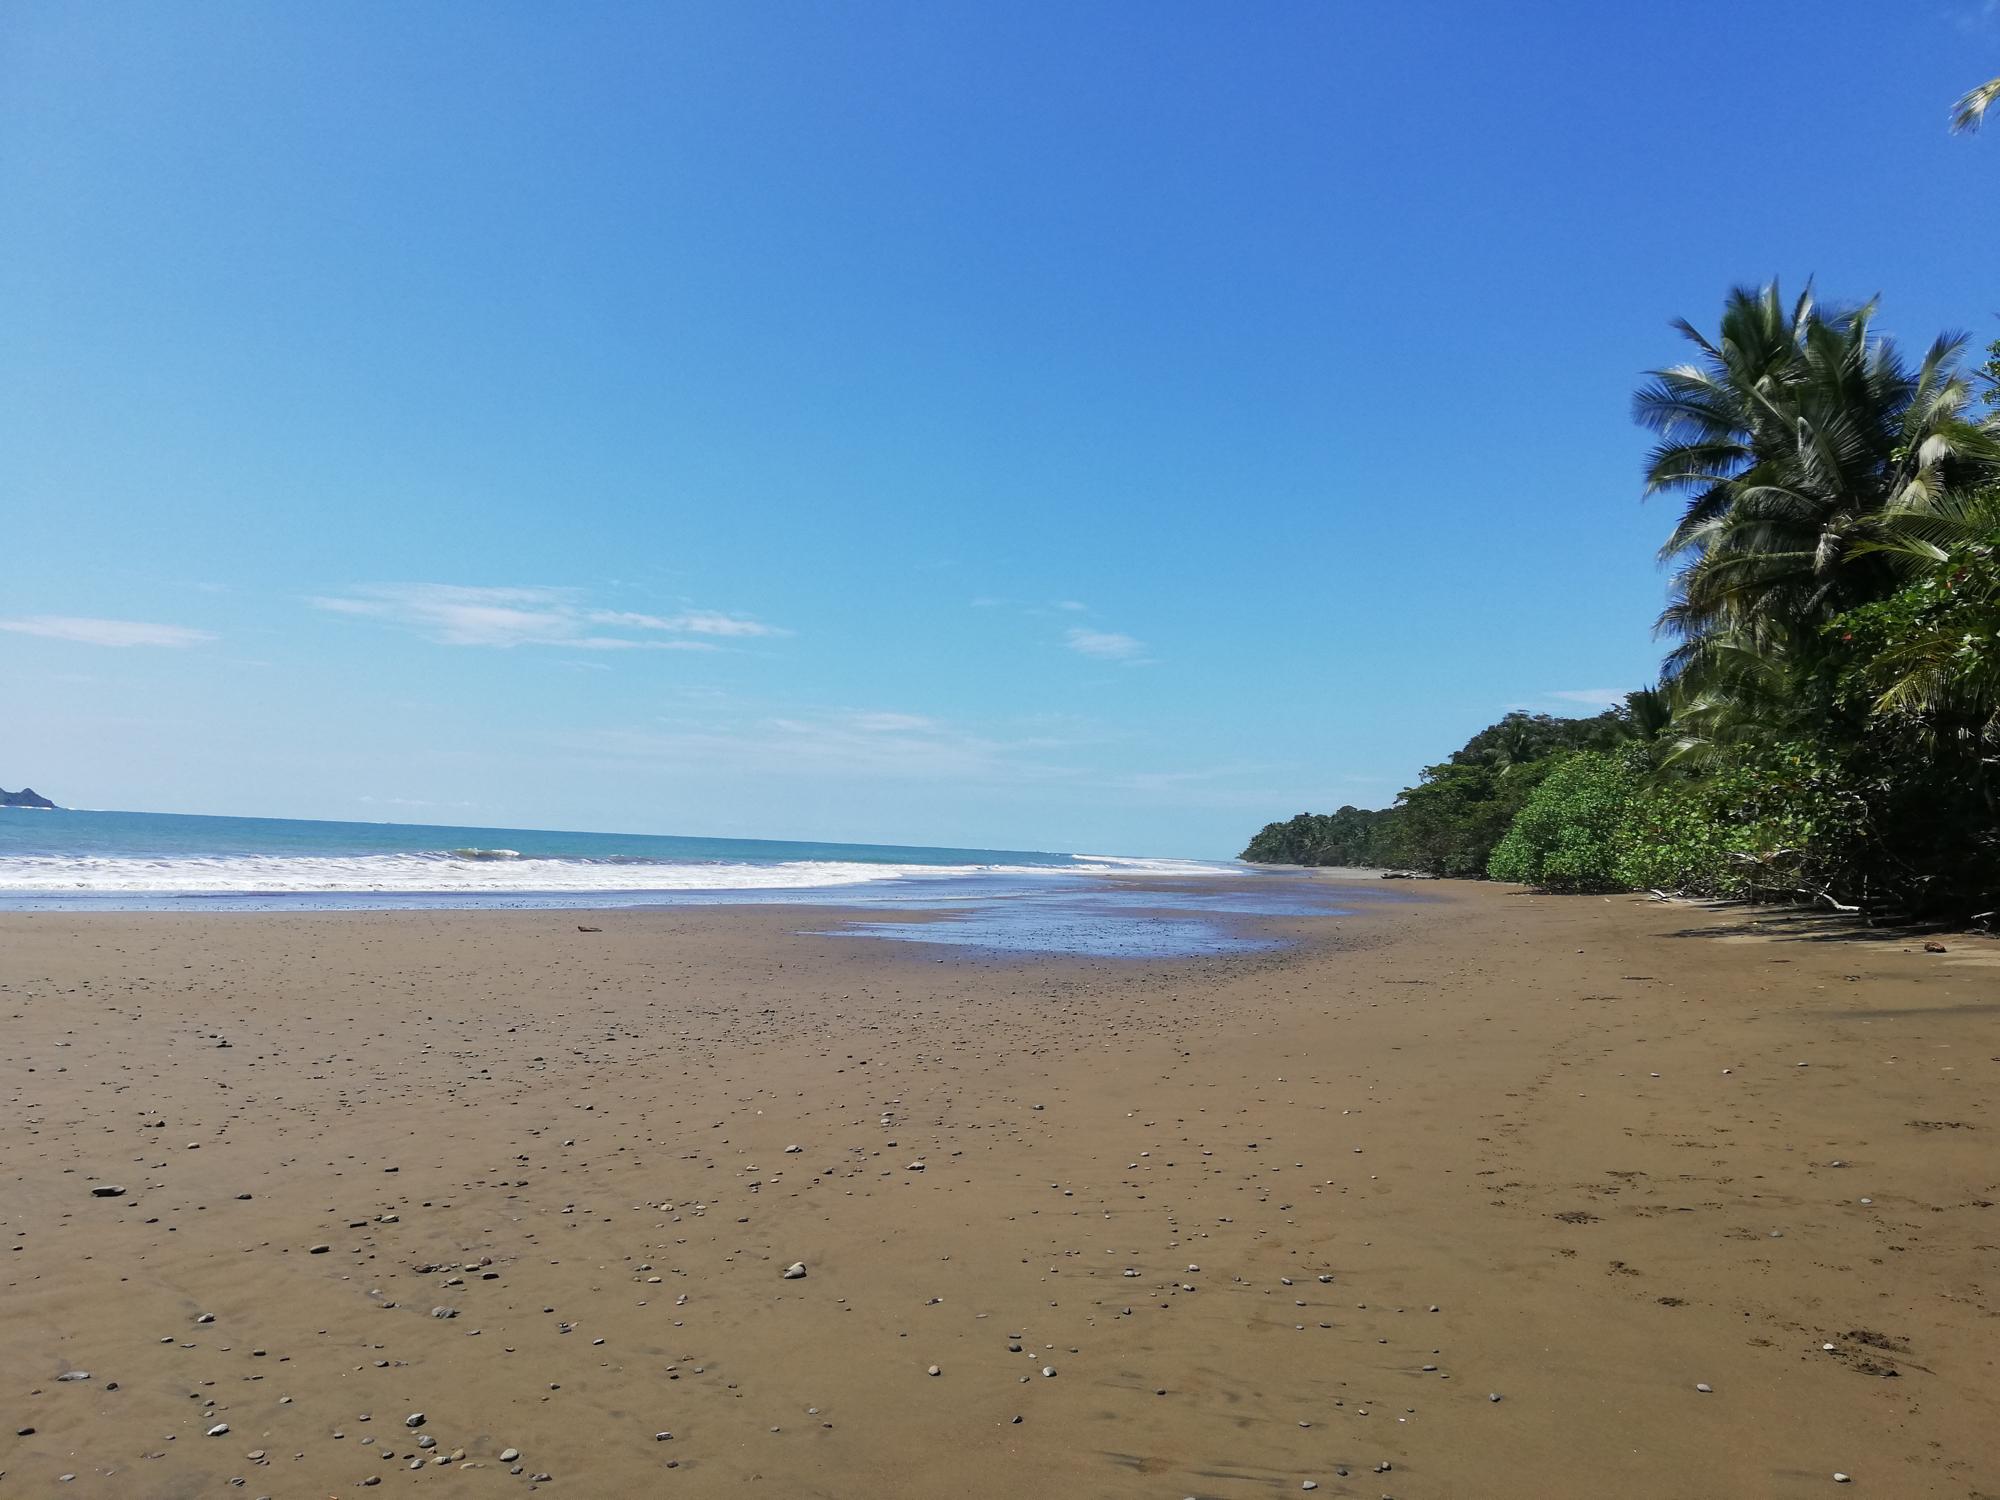 Playa Ballena South Pacific Costa Riva Beaches 1